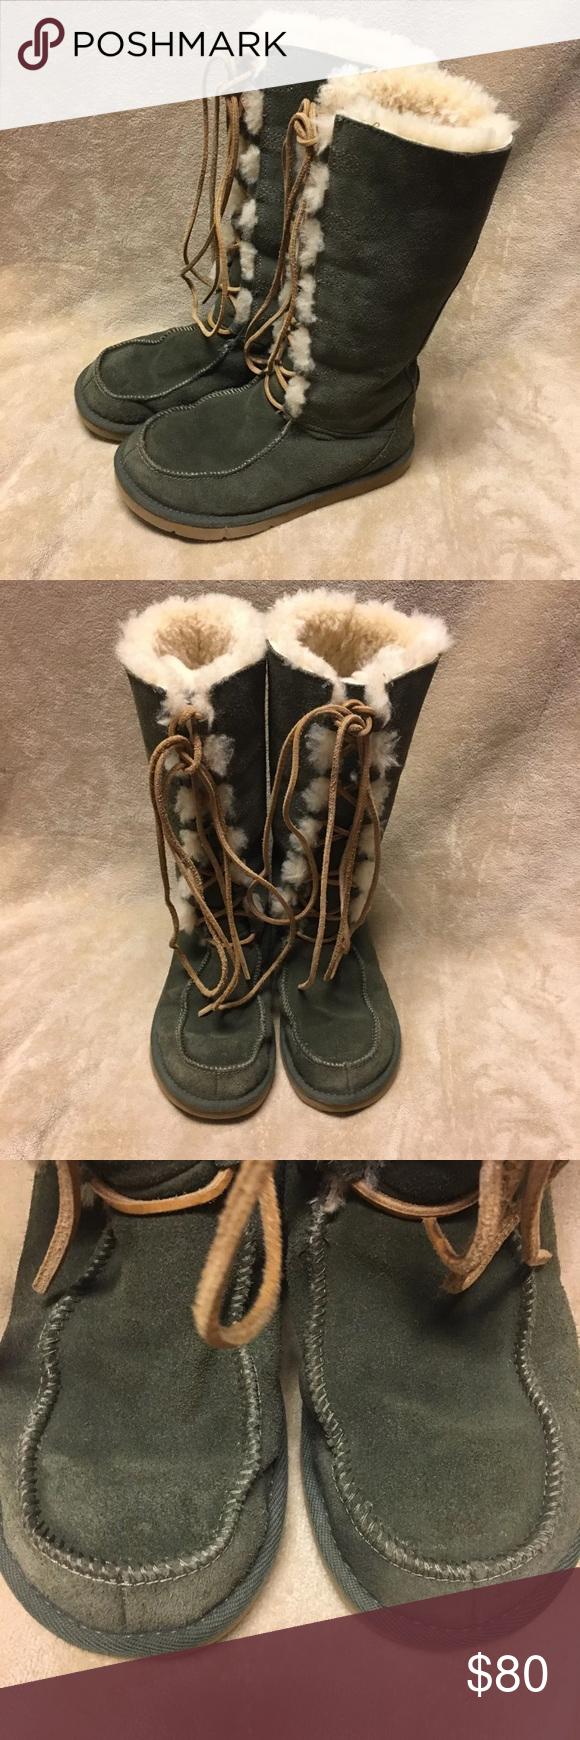 08080a59b48 UGG Boots | My Posh Picks | Ugg boots, Boots, Uggs